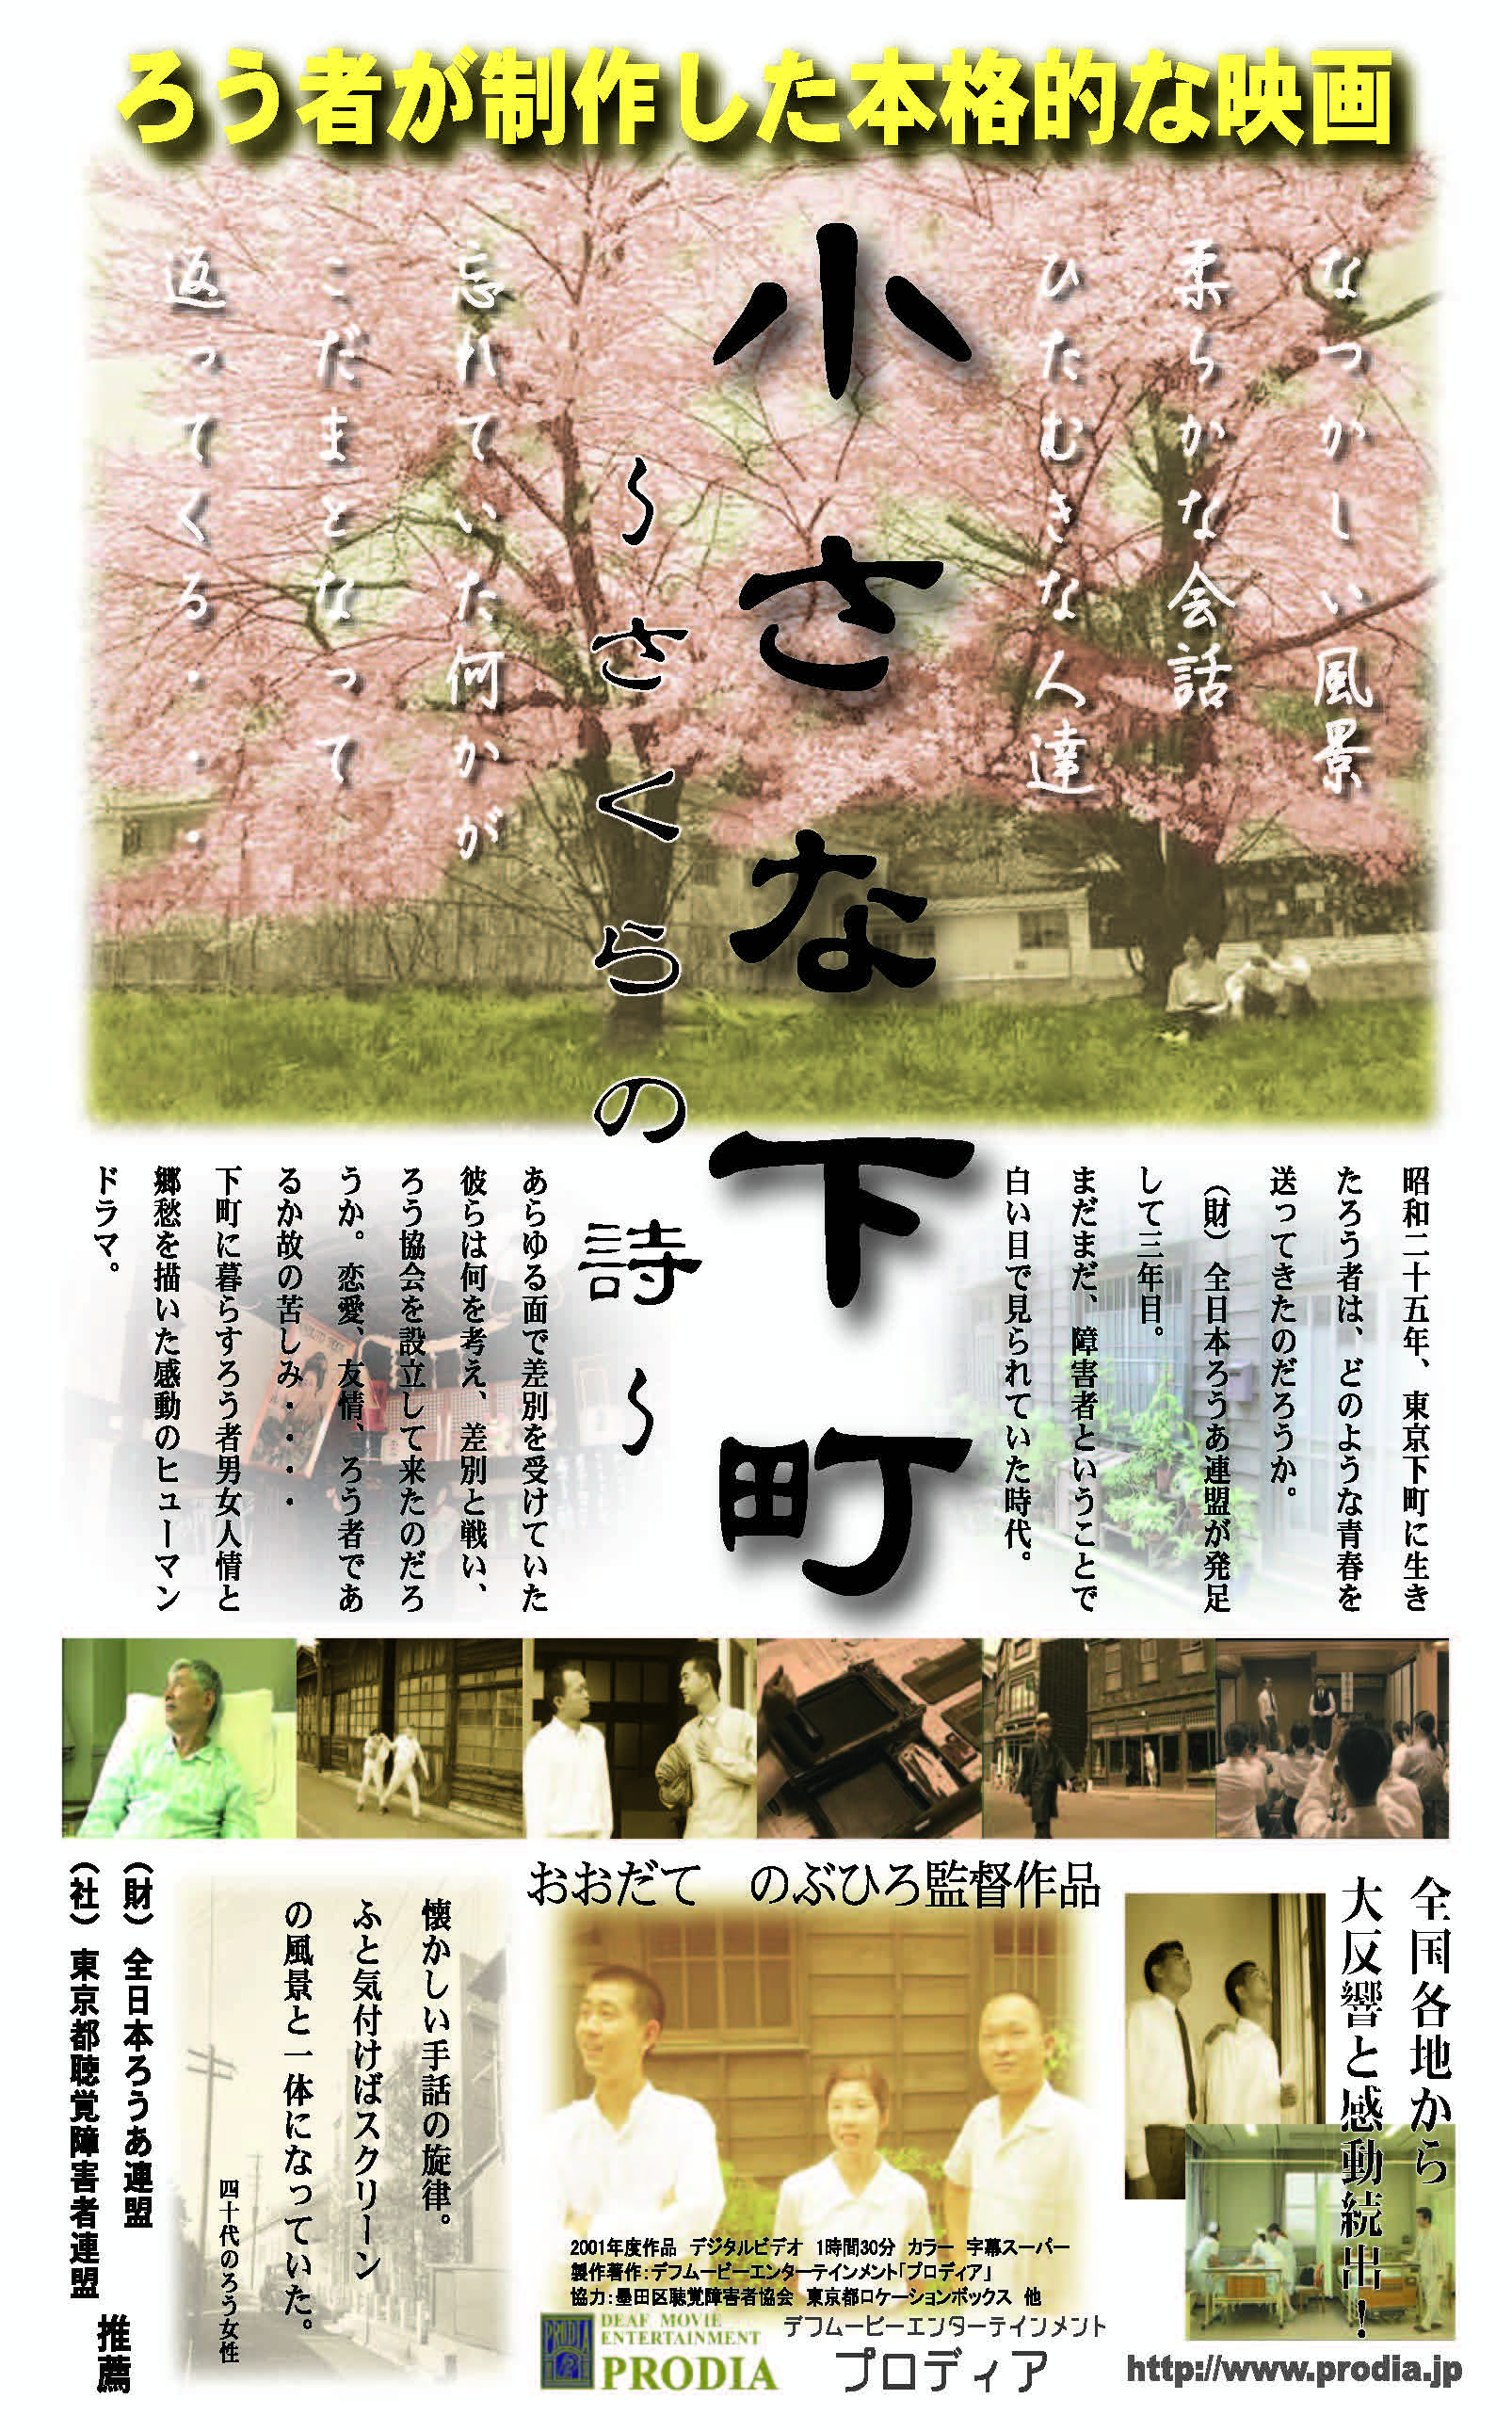 OdateShitamachiOmote2